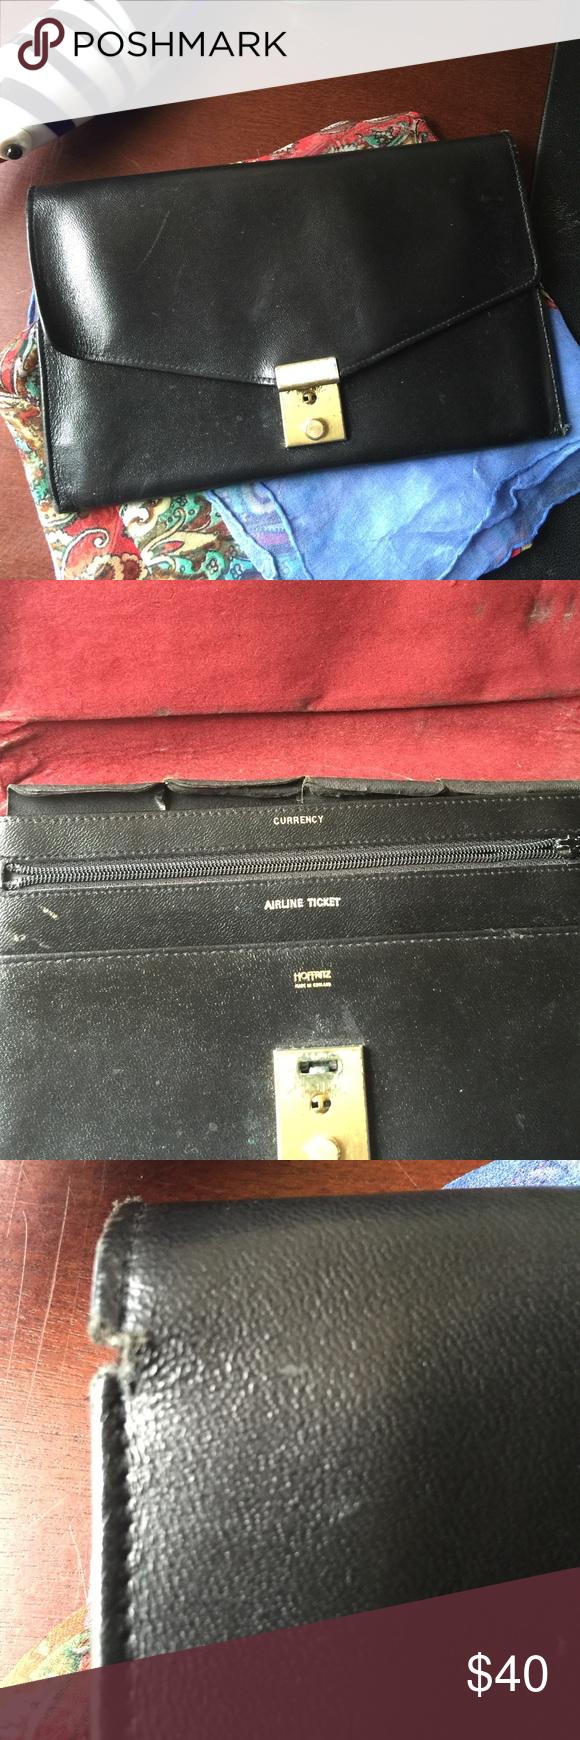 2 X Hp Fab Vintage Hoffritz Travel Wallet Travel Wallets Vintage Accessories Vintage